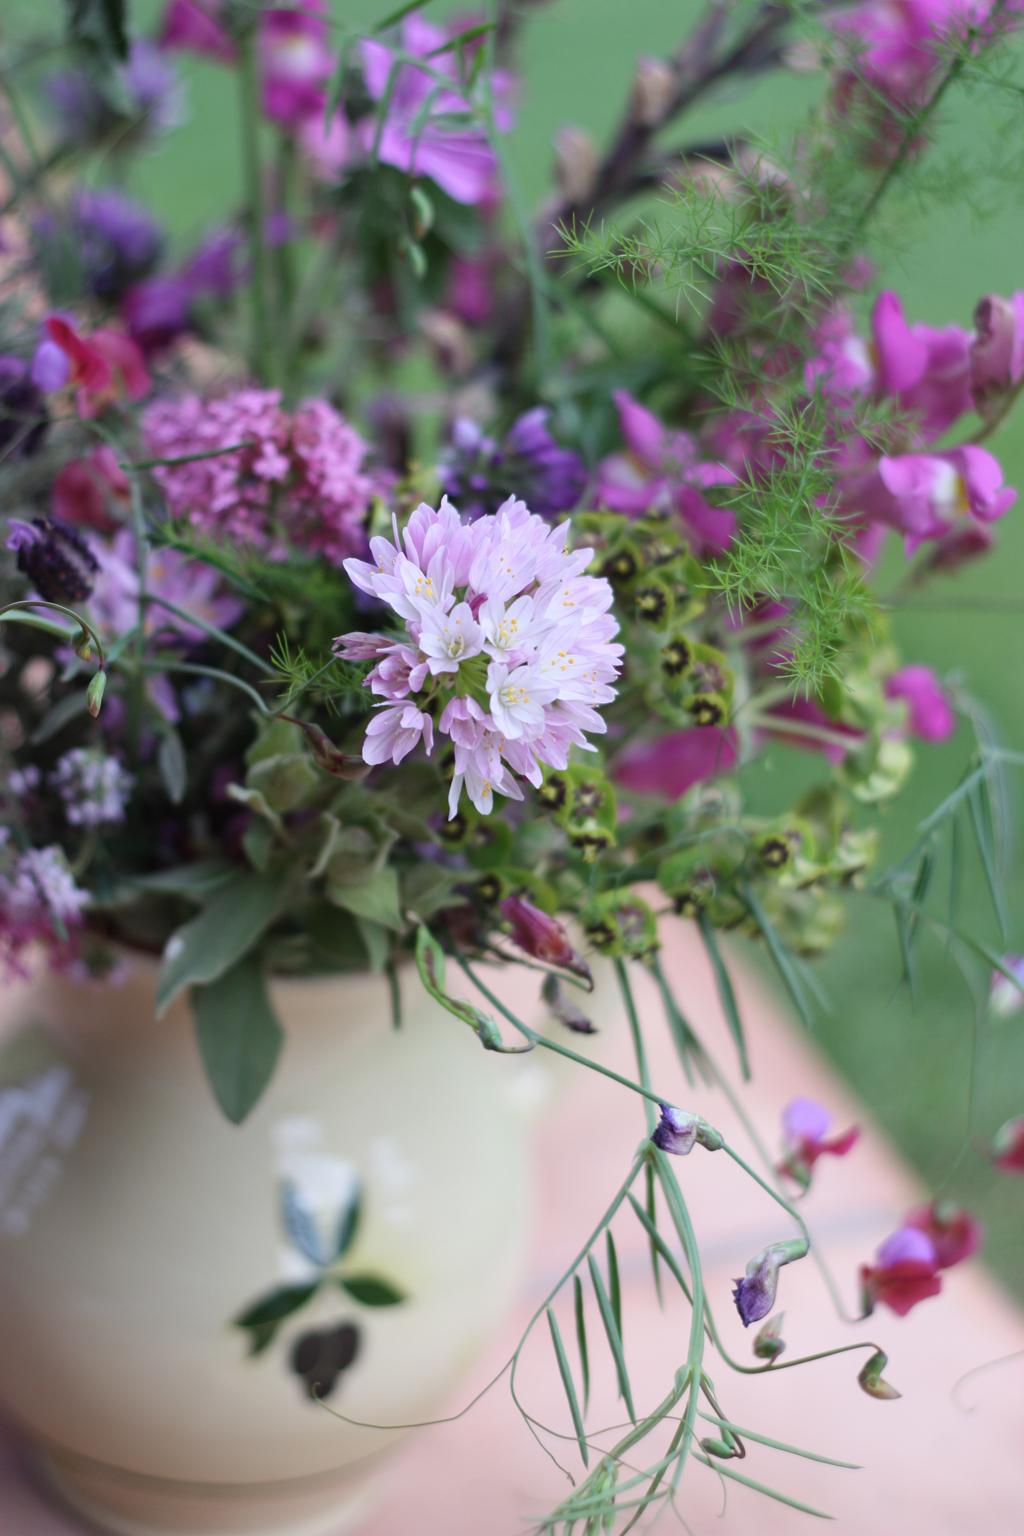 wild_flowers_in_Spain_9